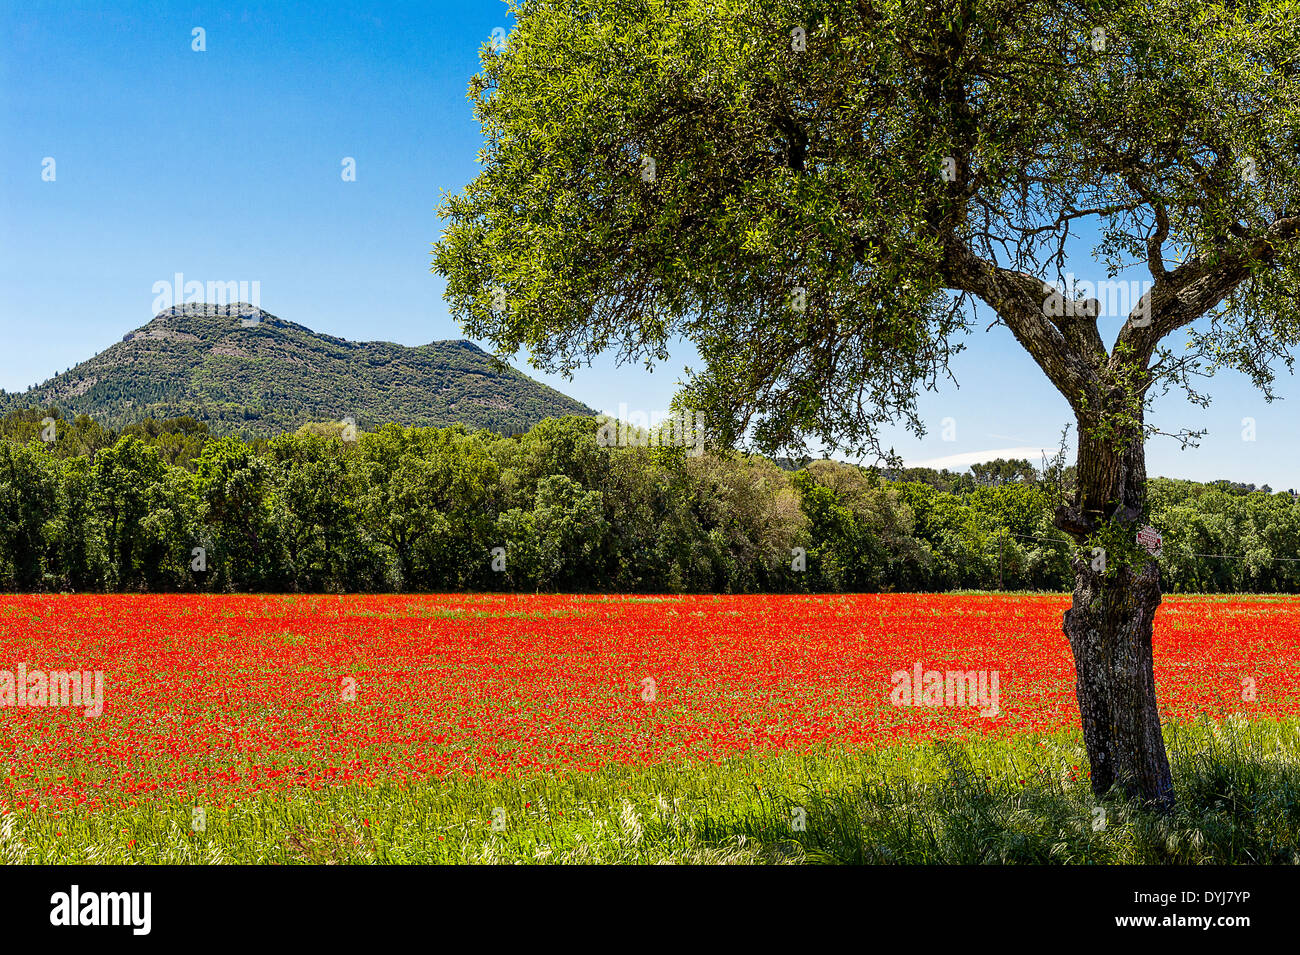 Europe, France, Var, hinterland. Poppies field. - Stock Image